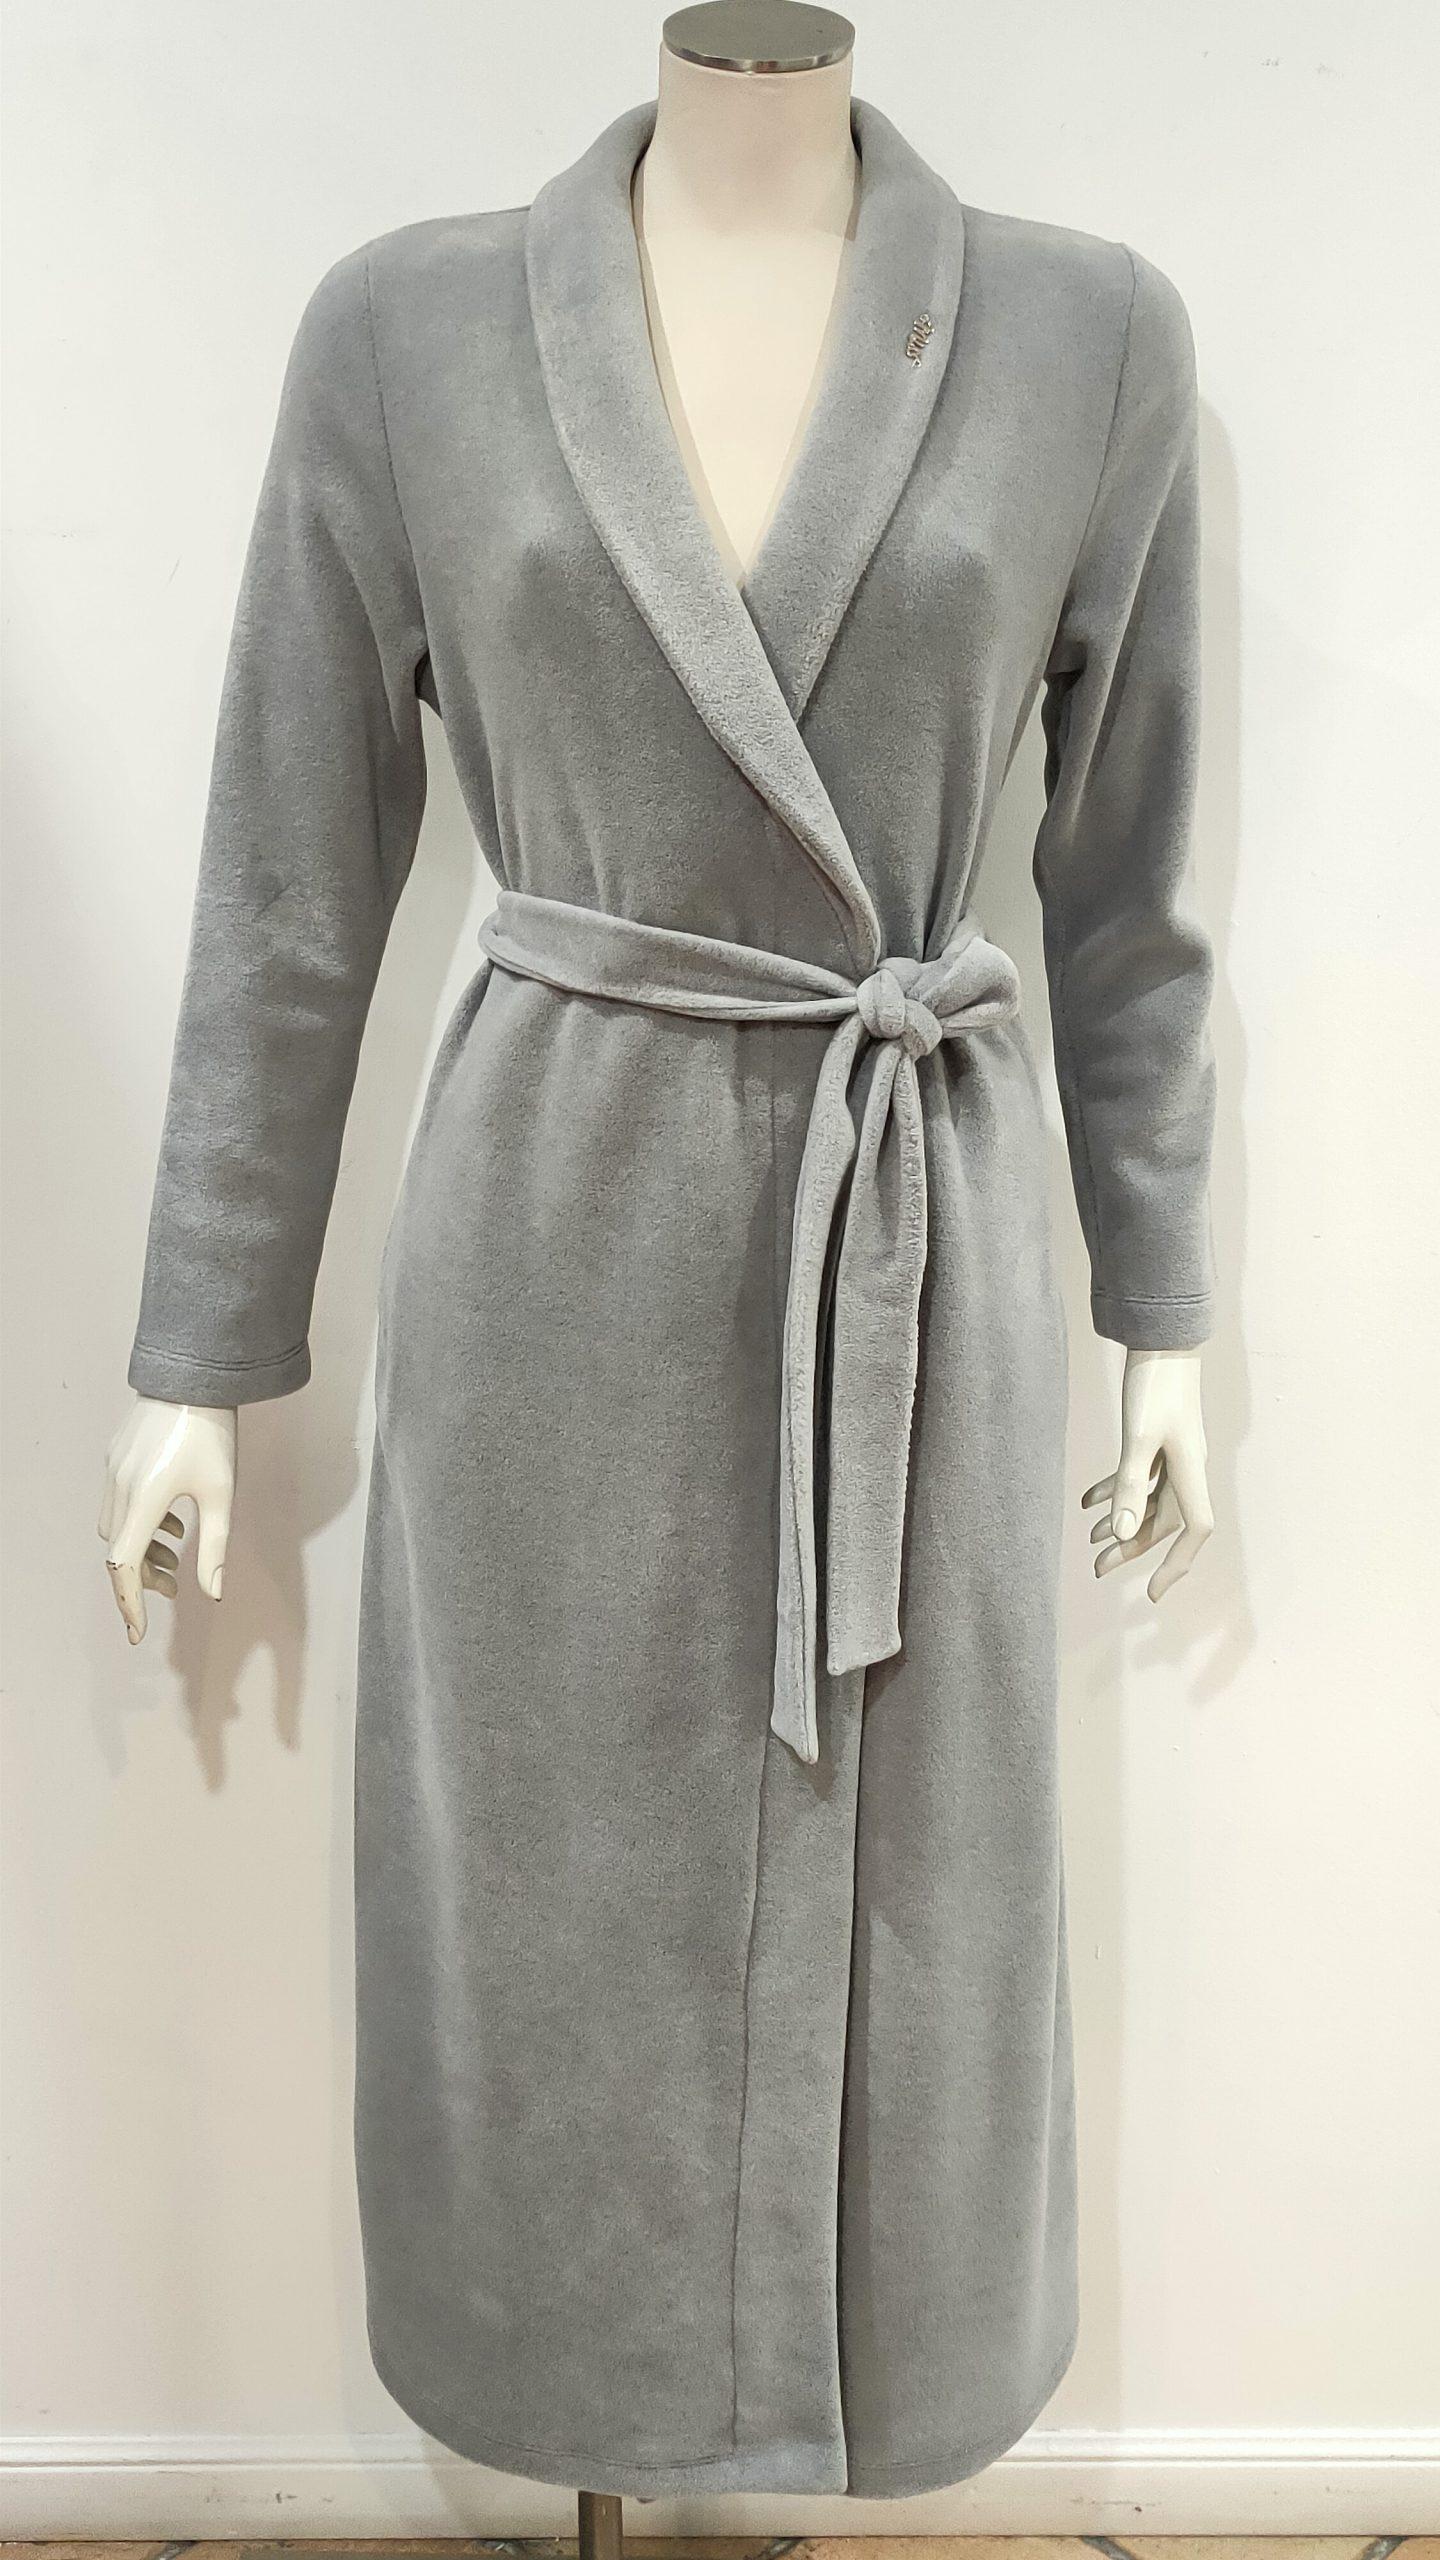 Vestaglia invernale lunga grigio